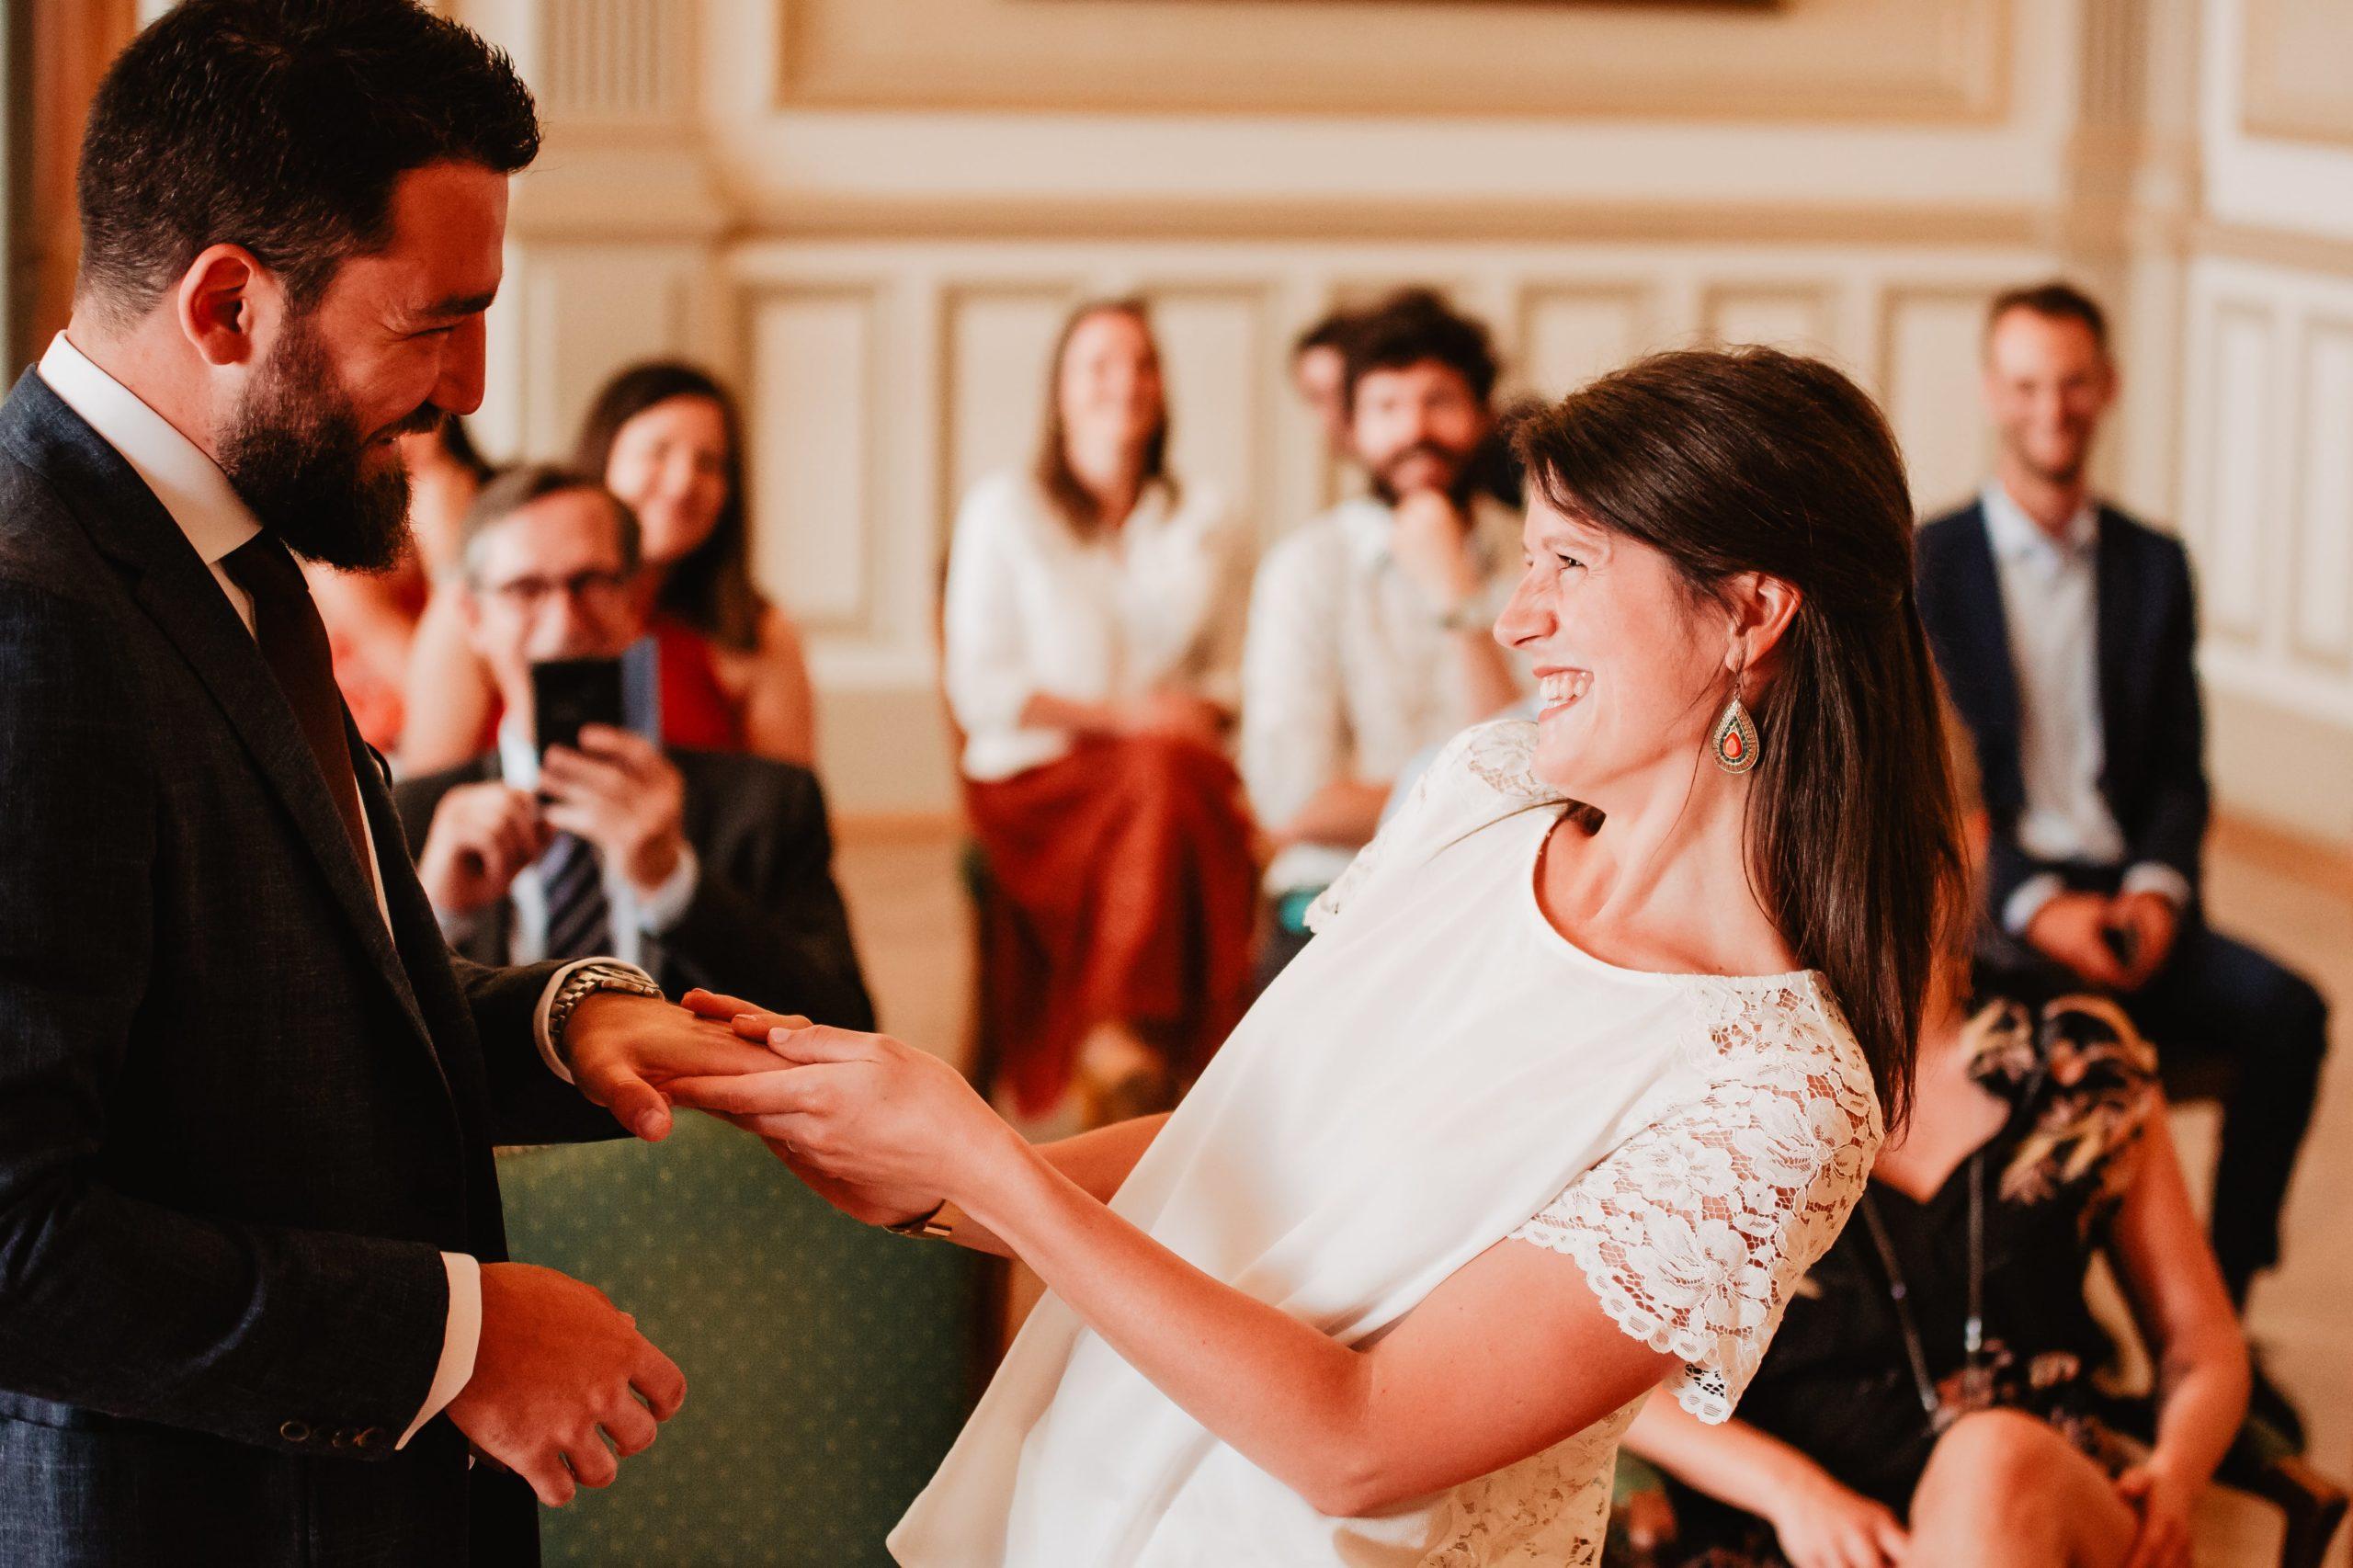 cérémonie mariage civile mairie lyon 6